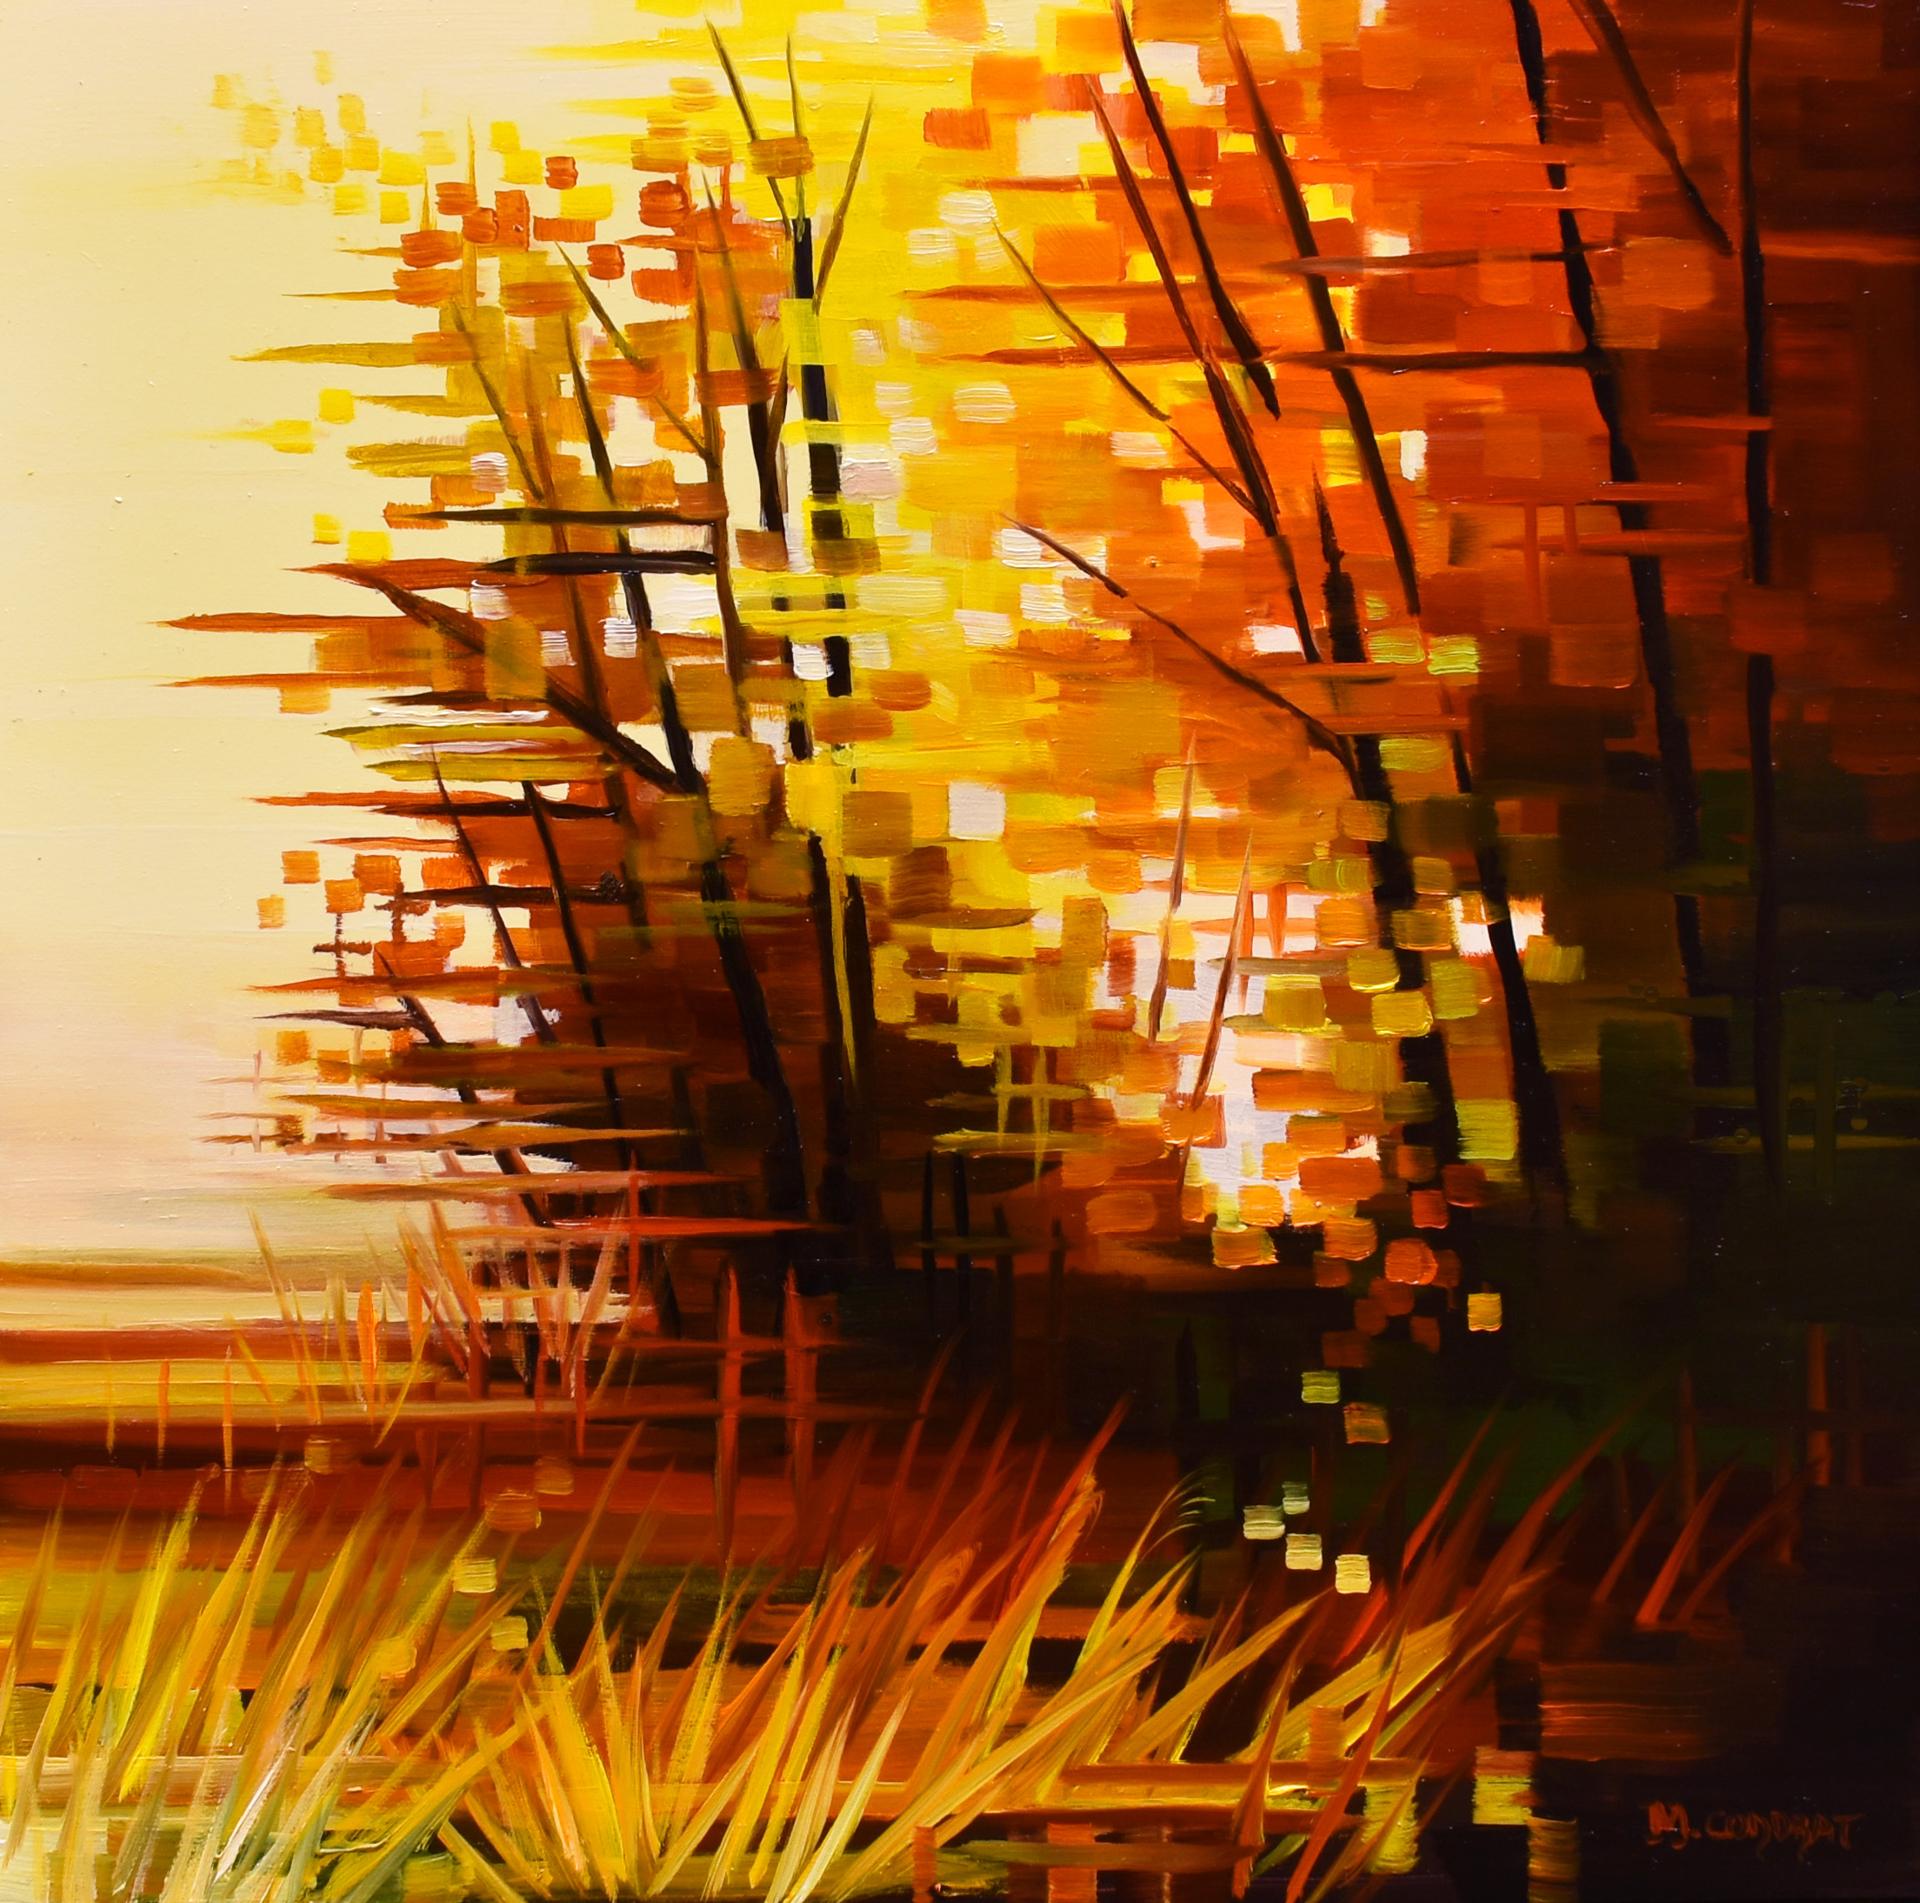 Autumn's Color Spectacular by Michelle Condrat